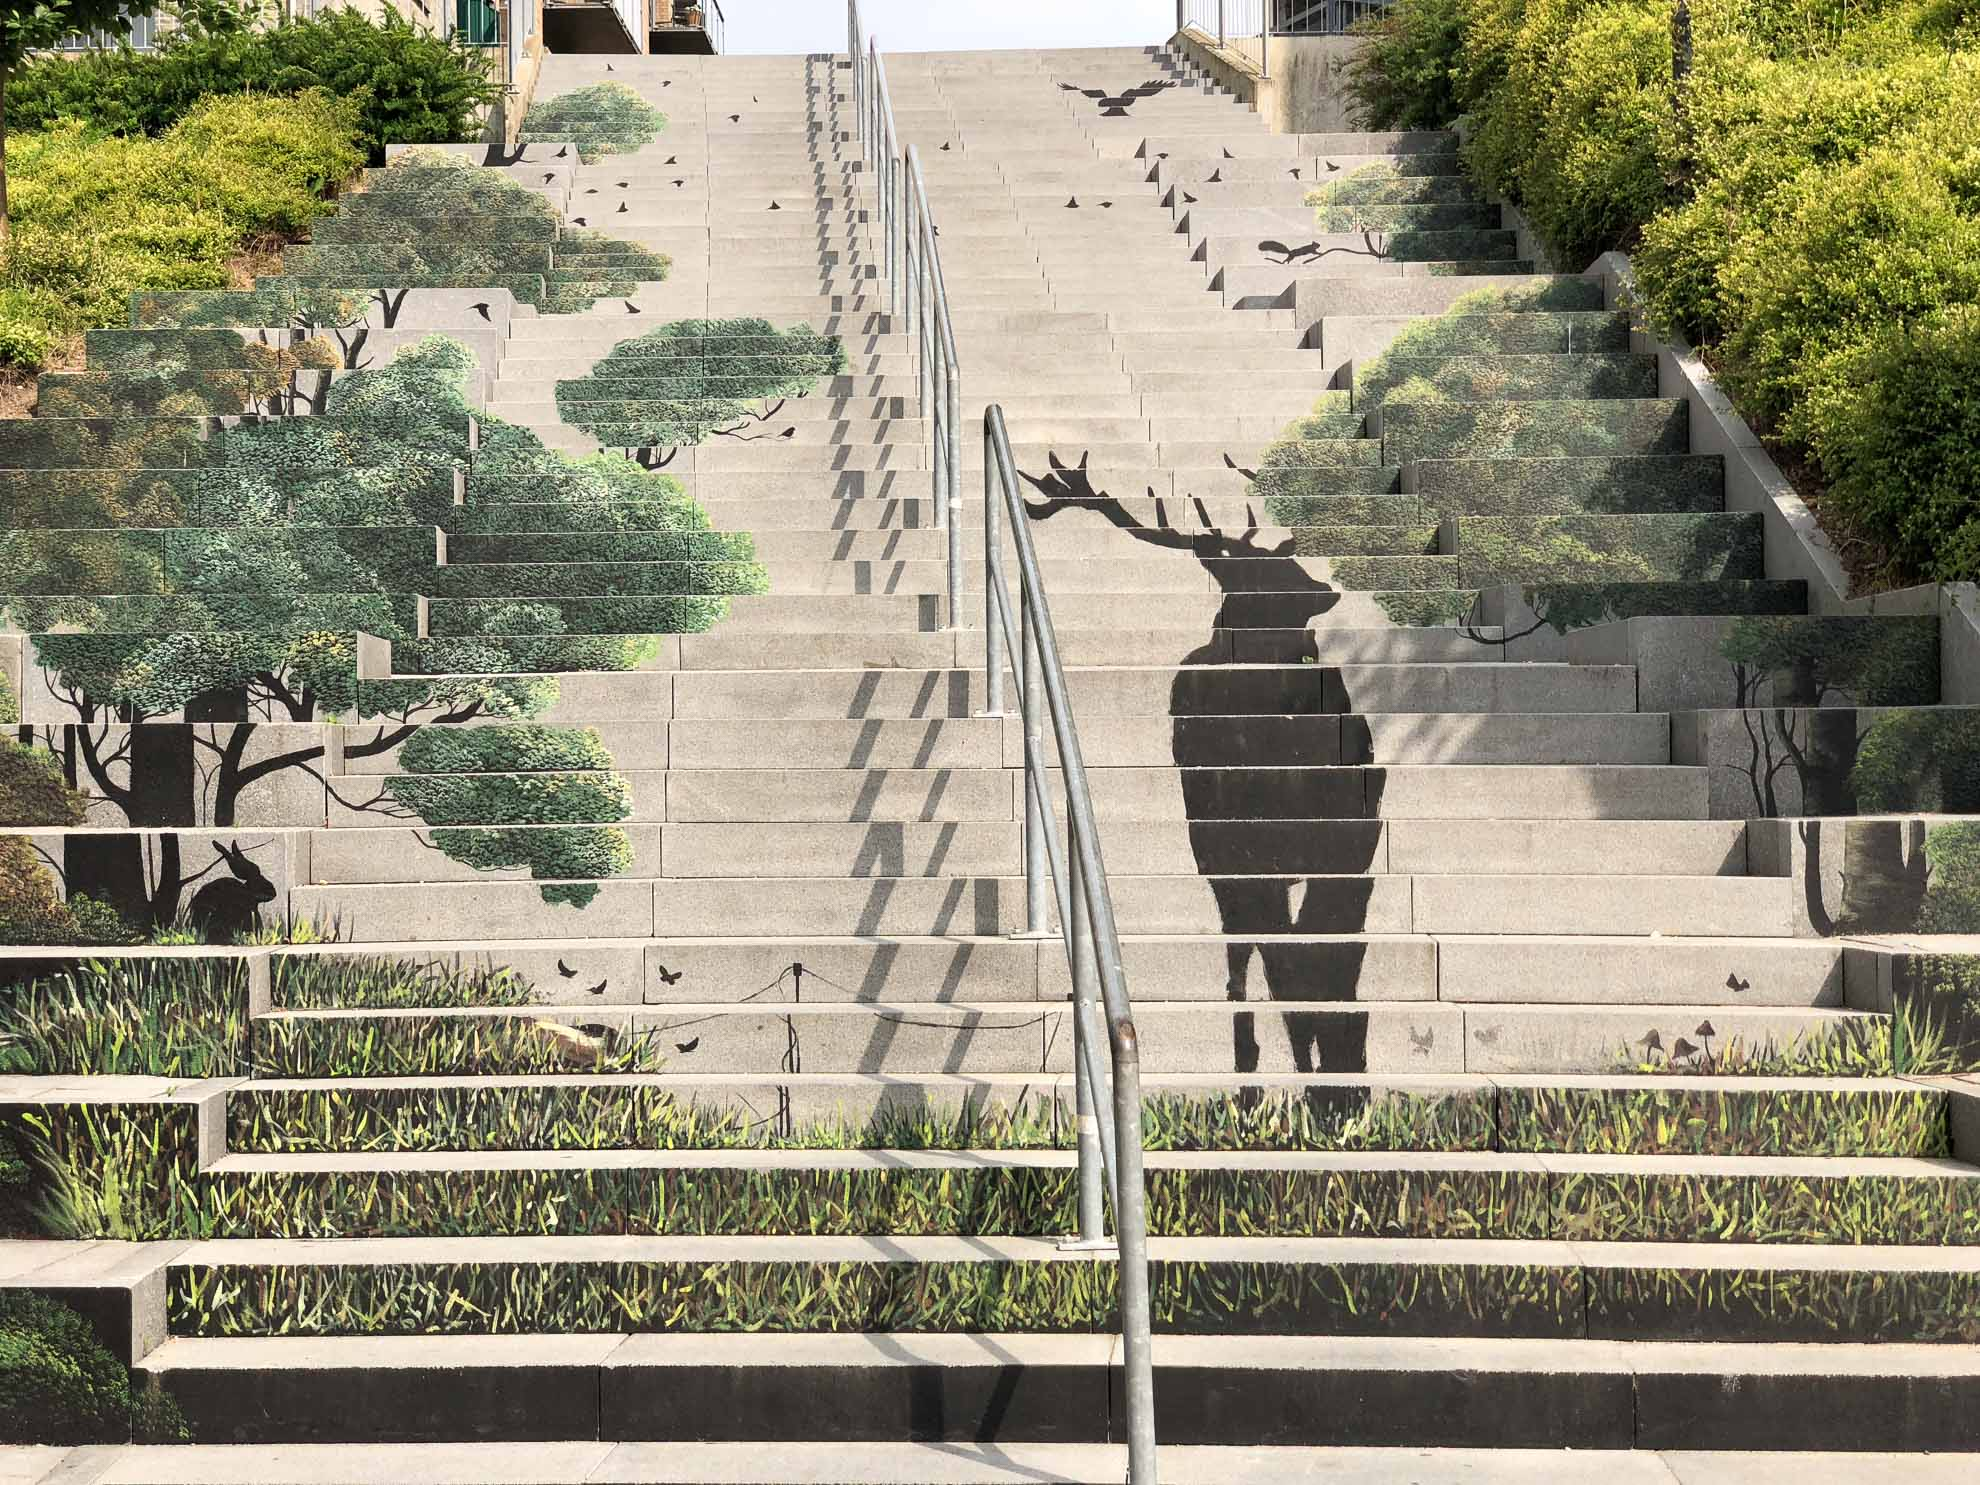 Treppenkunst in der Stadt.